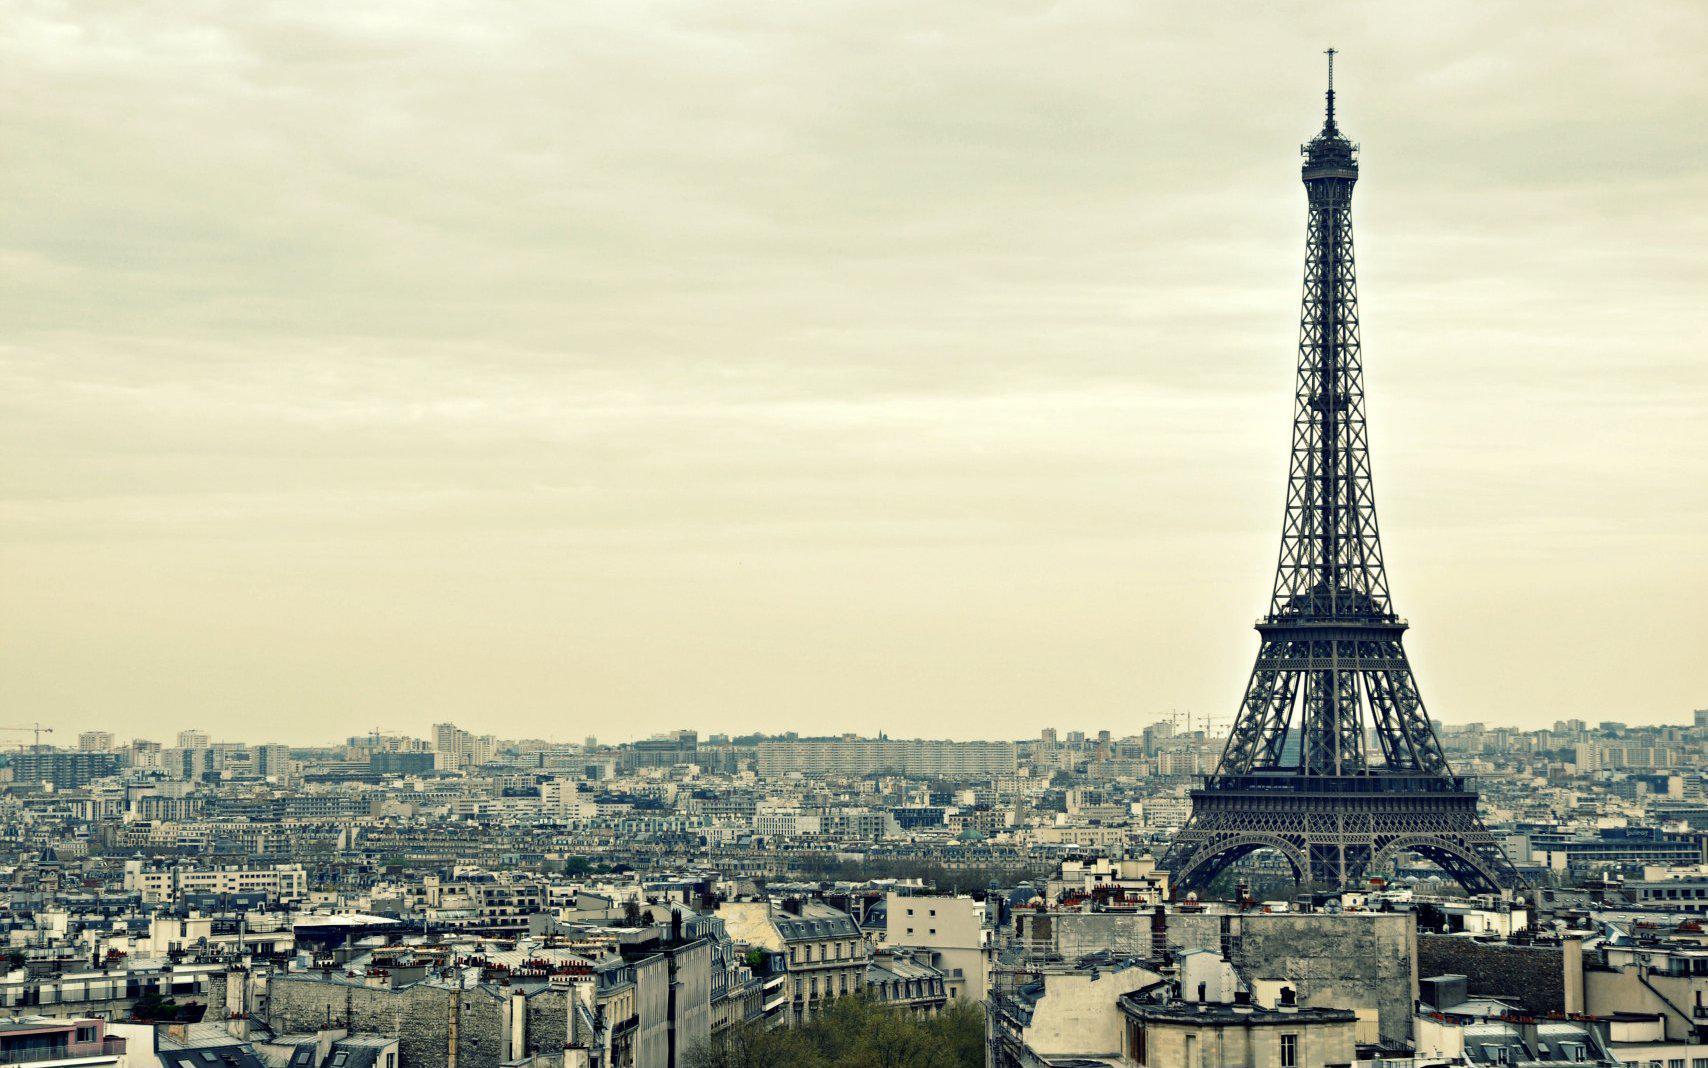 Cute Eiffel Tower Wallpaper: Eiffel Tower Wallpaper